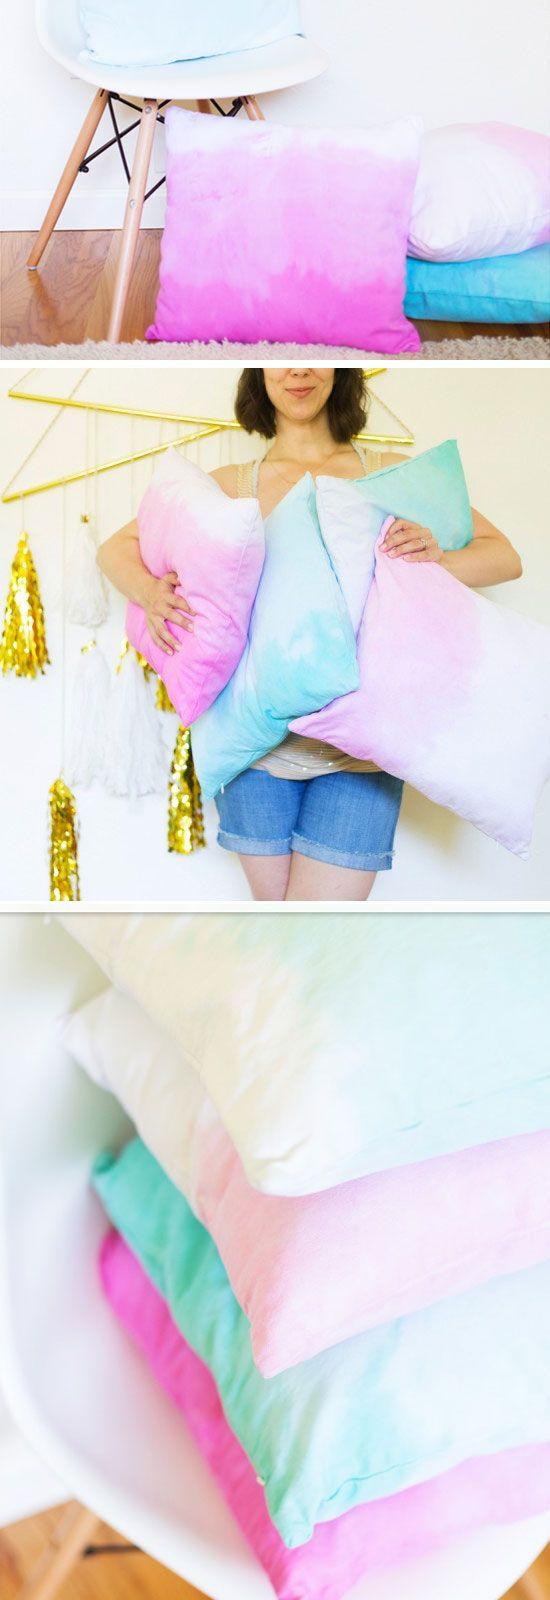 Ombre Throw Pillows | DIY Dorm Room Ideas for Girls